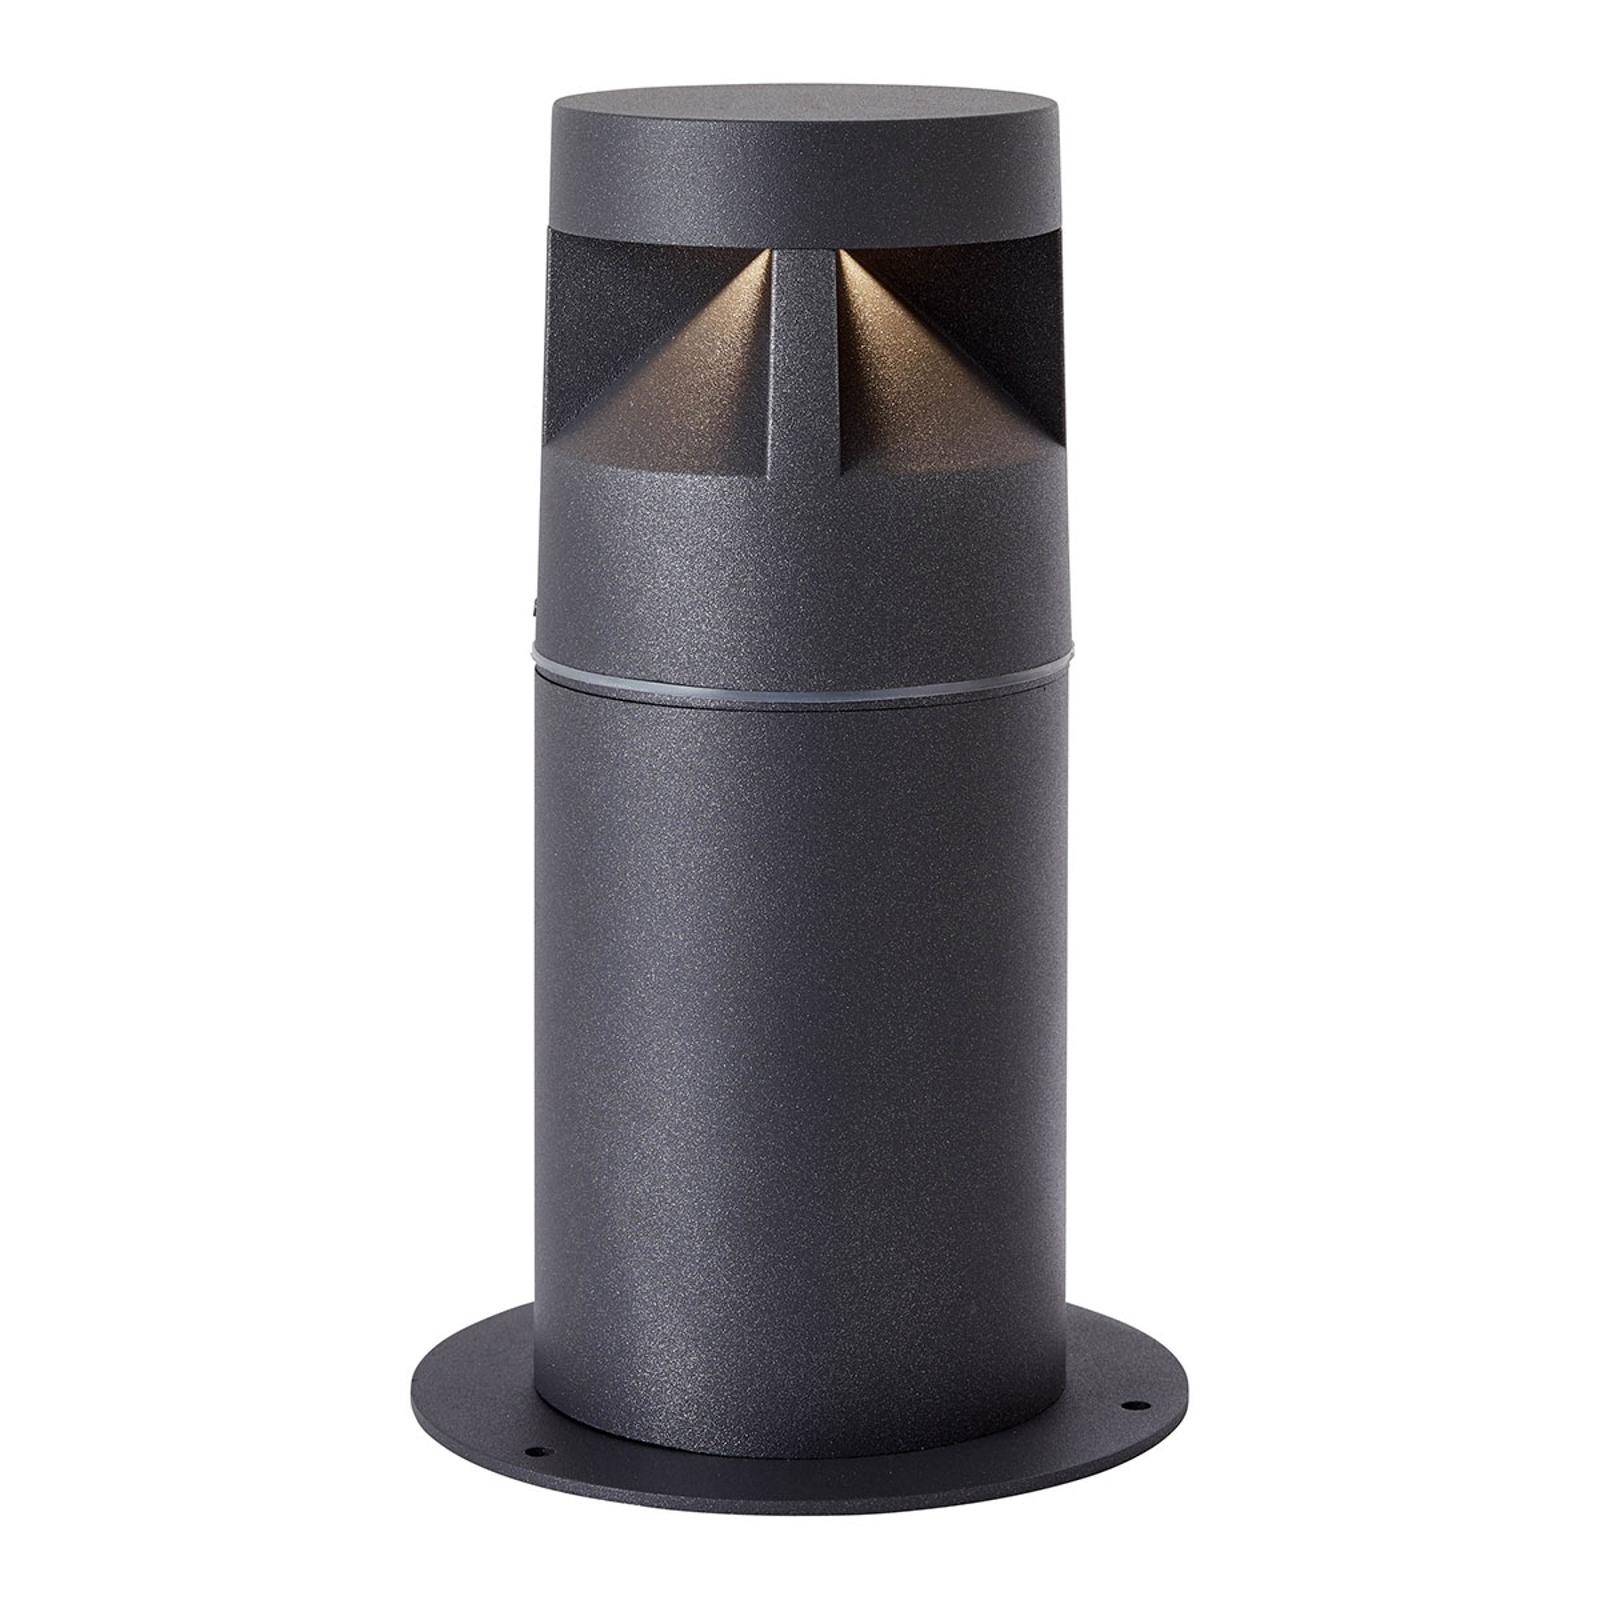 AEG Winslow LED-Sockelleuchte, Höhe 26 cm